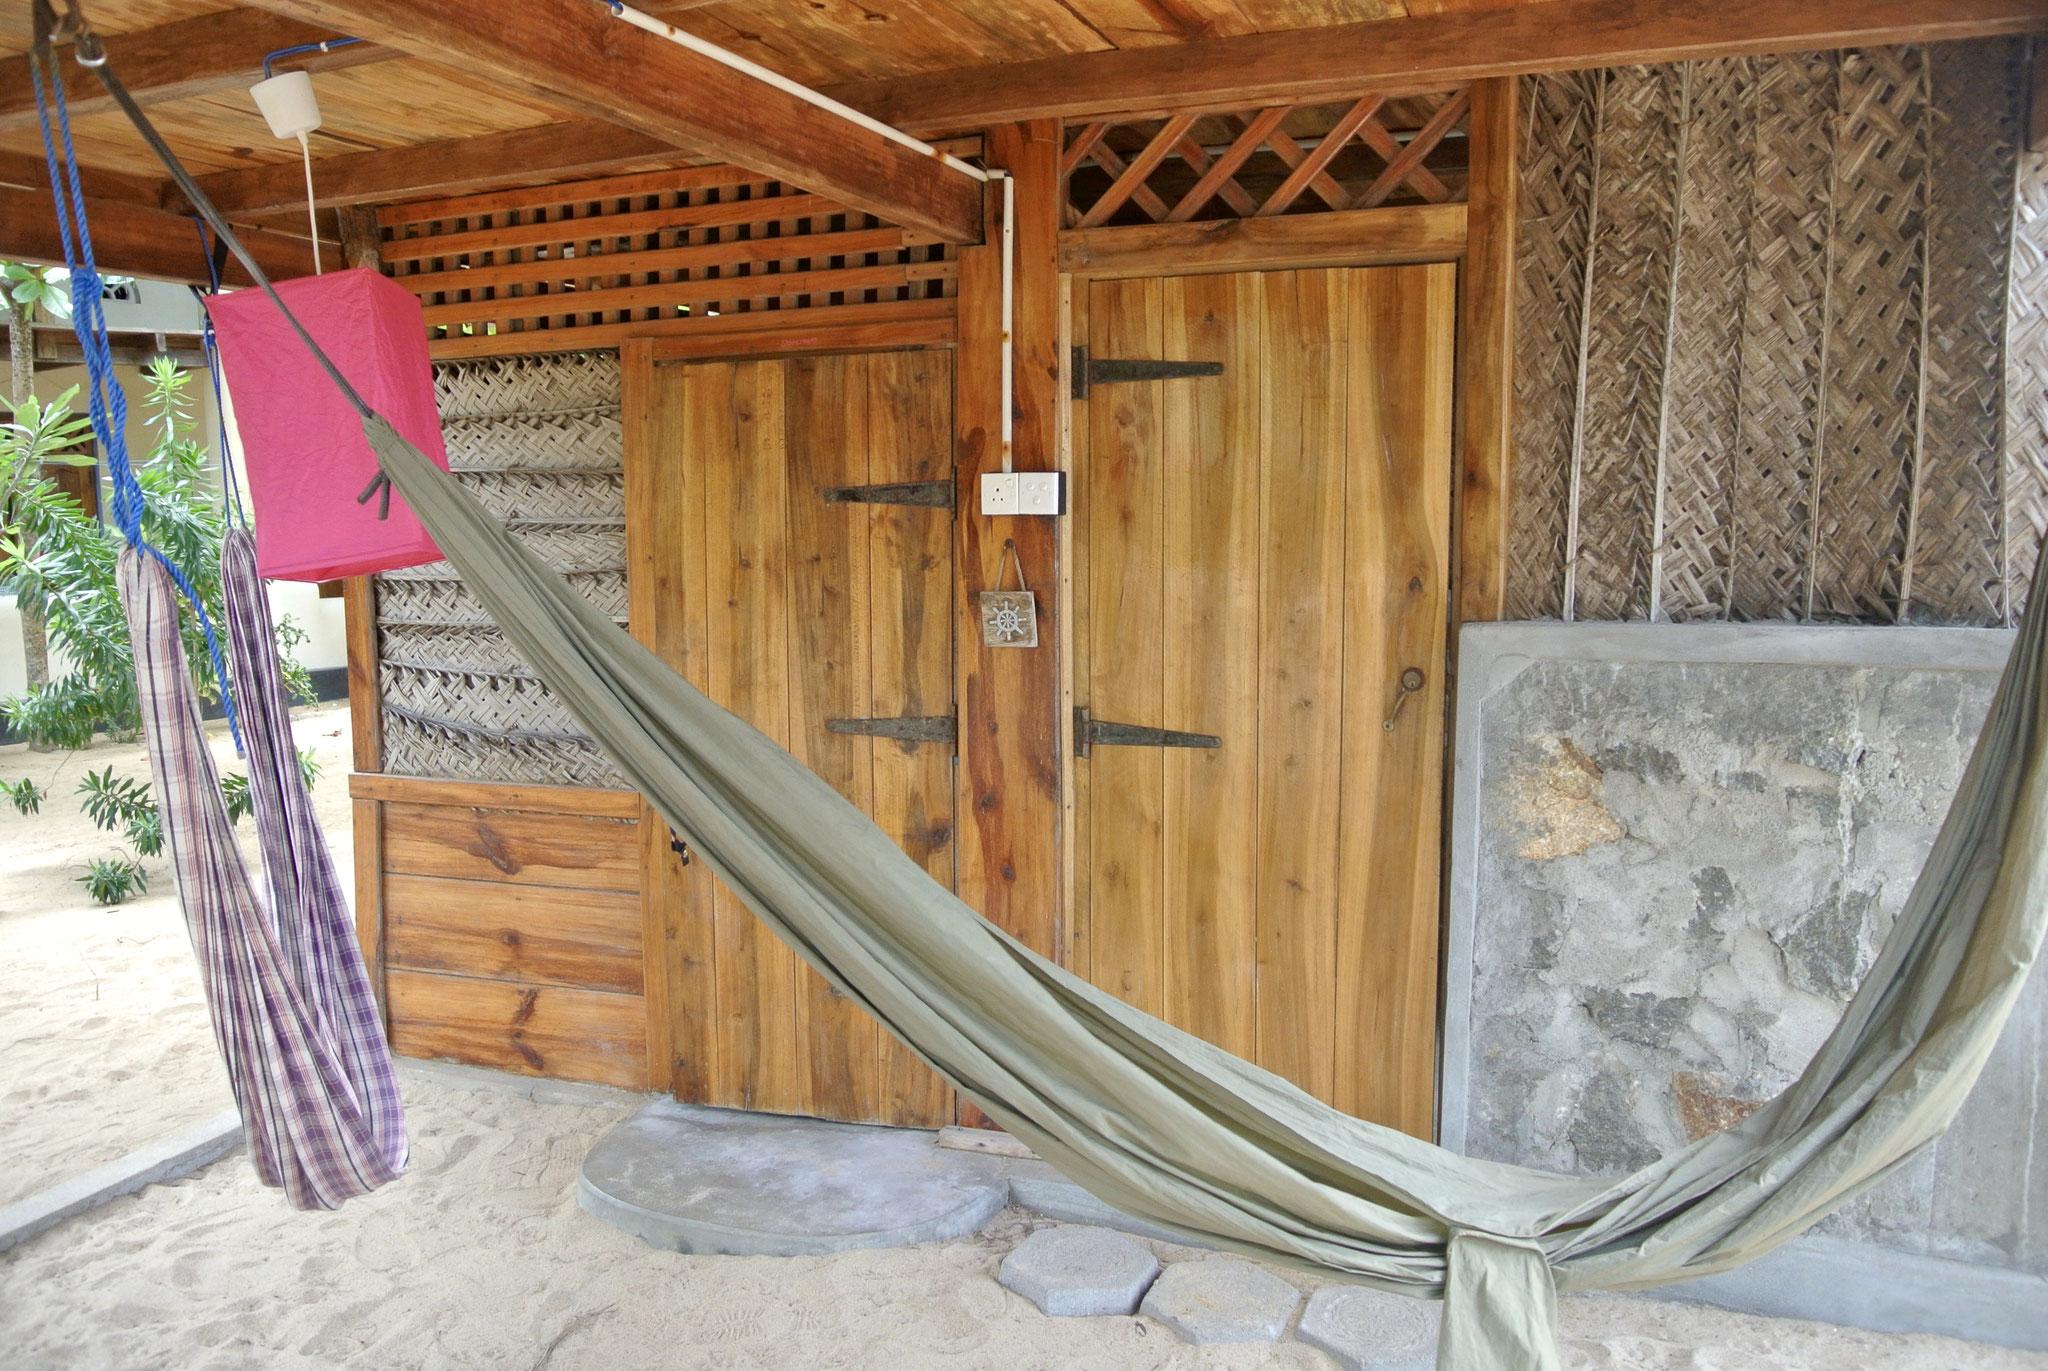 The Miro Cabana